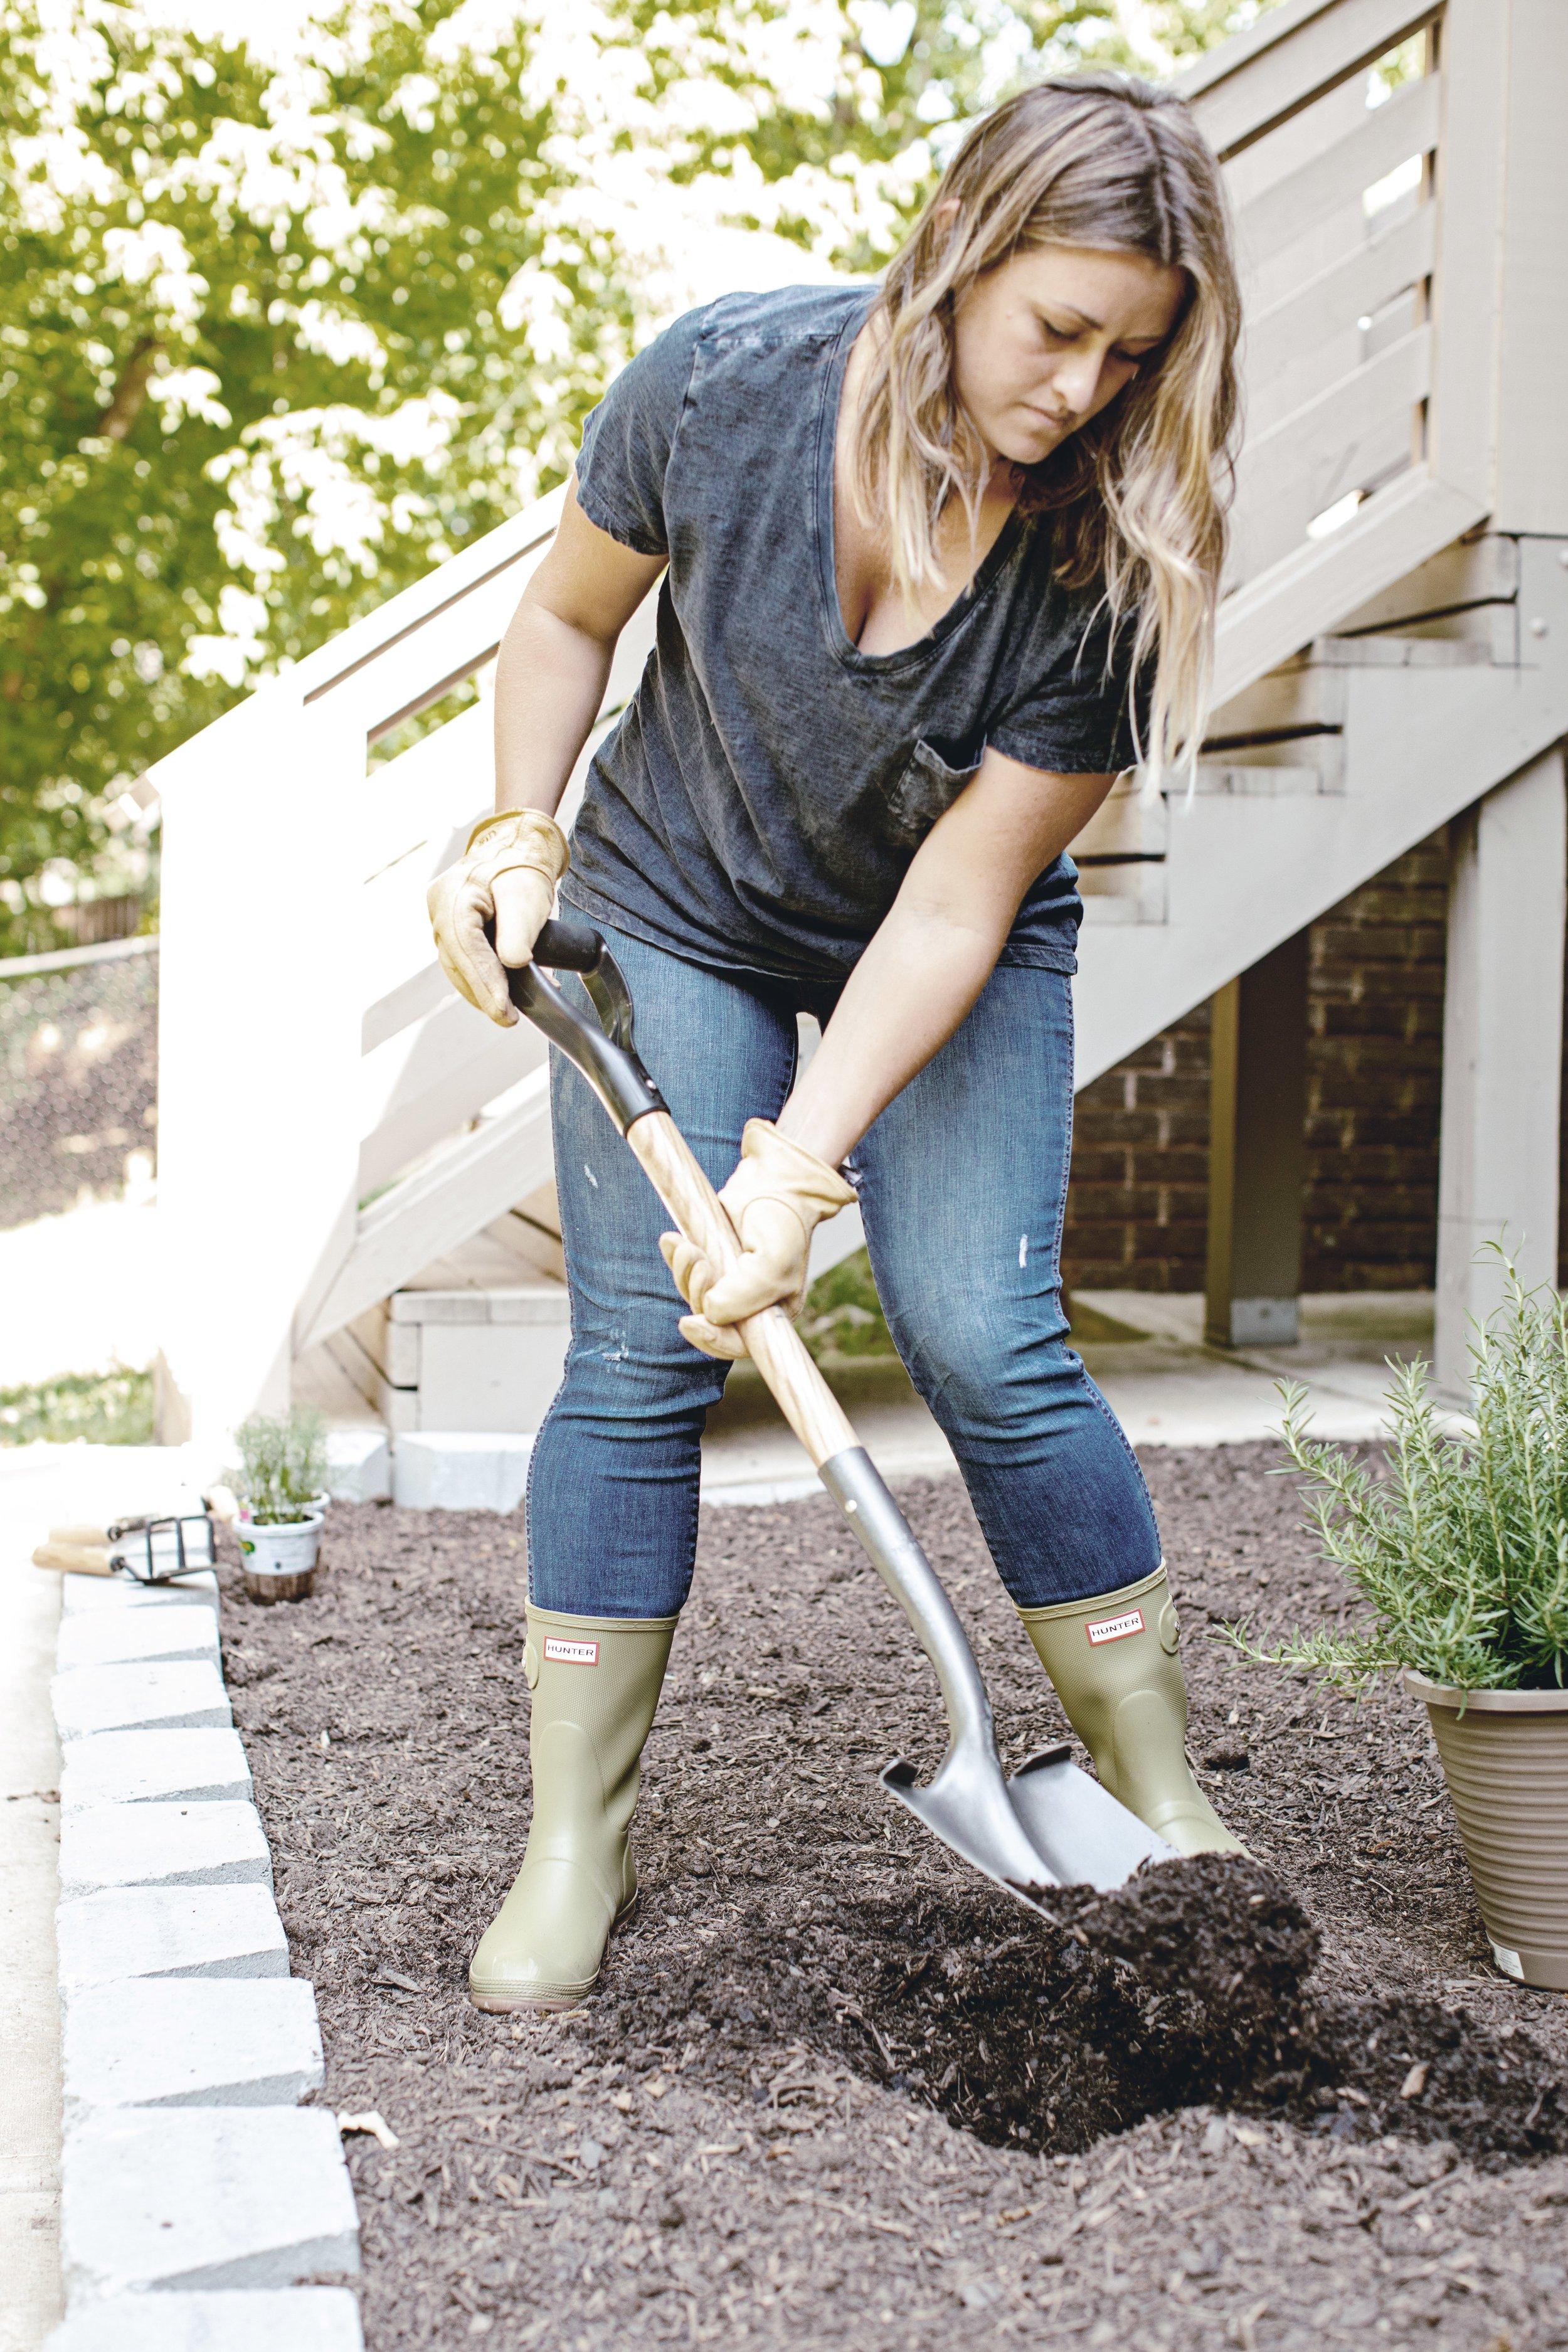 tips for planting a farmhouse garden / heirloomed for the Home Depot garden series